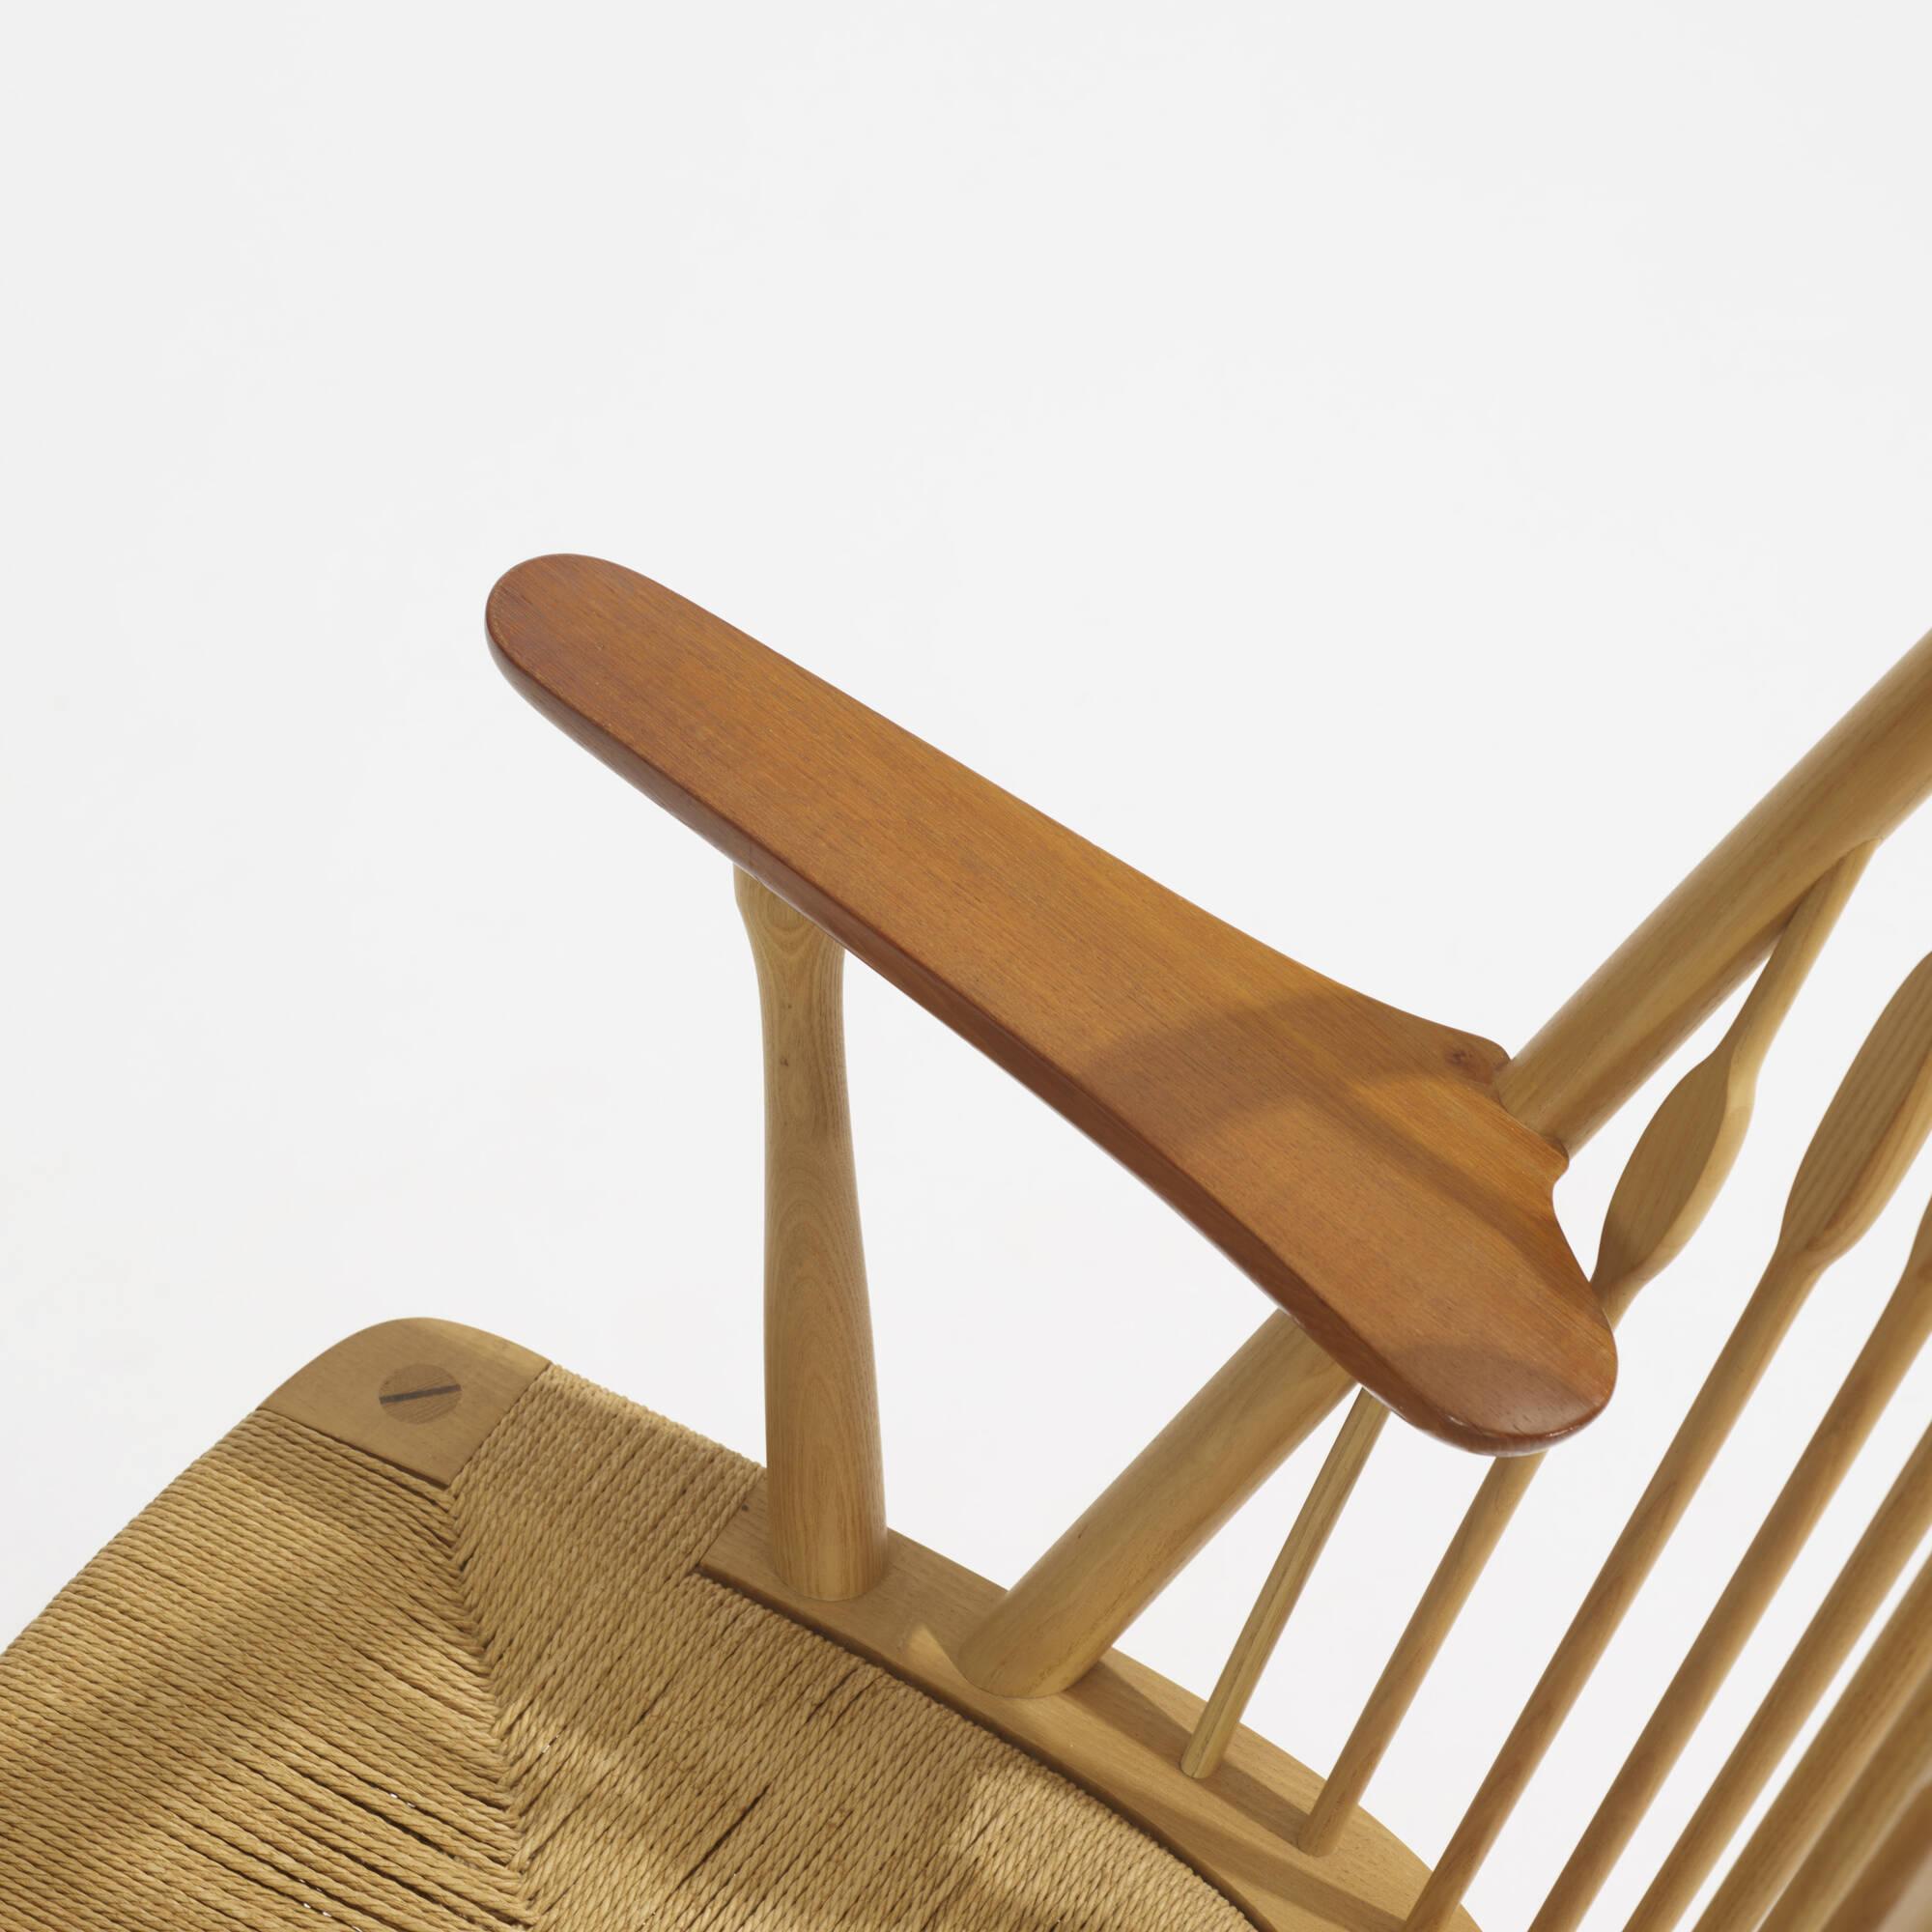 297: Hans J. Wegner / Peacock chairs, pair (3 of 4)